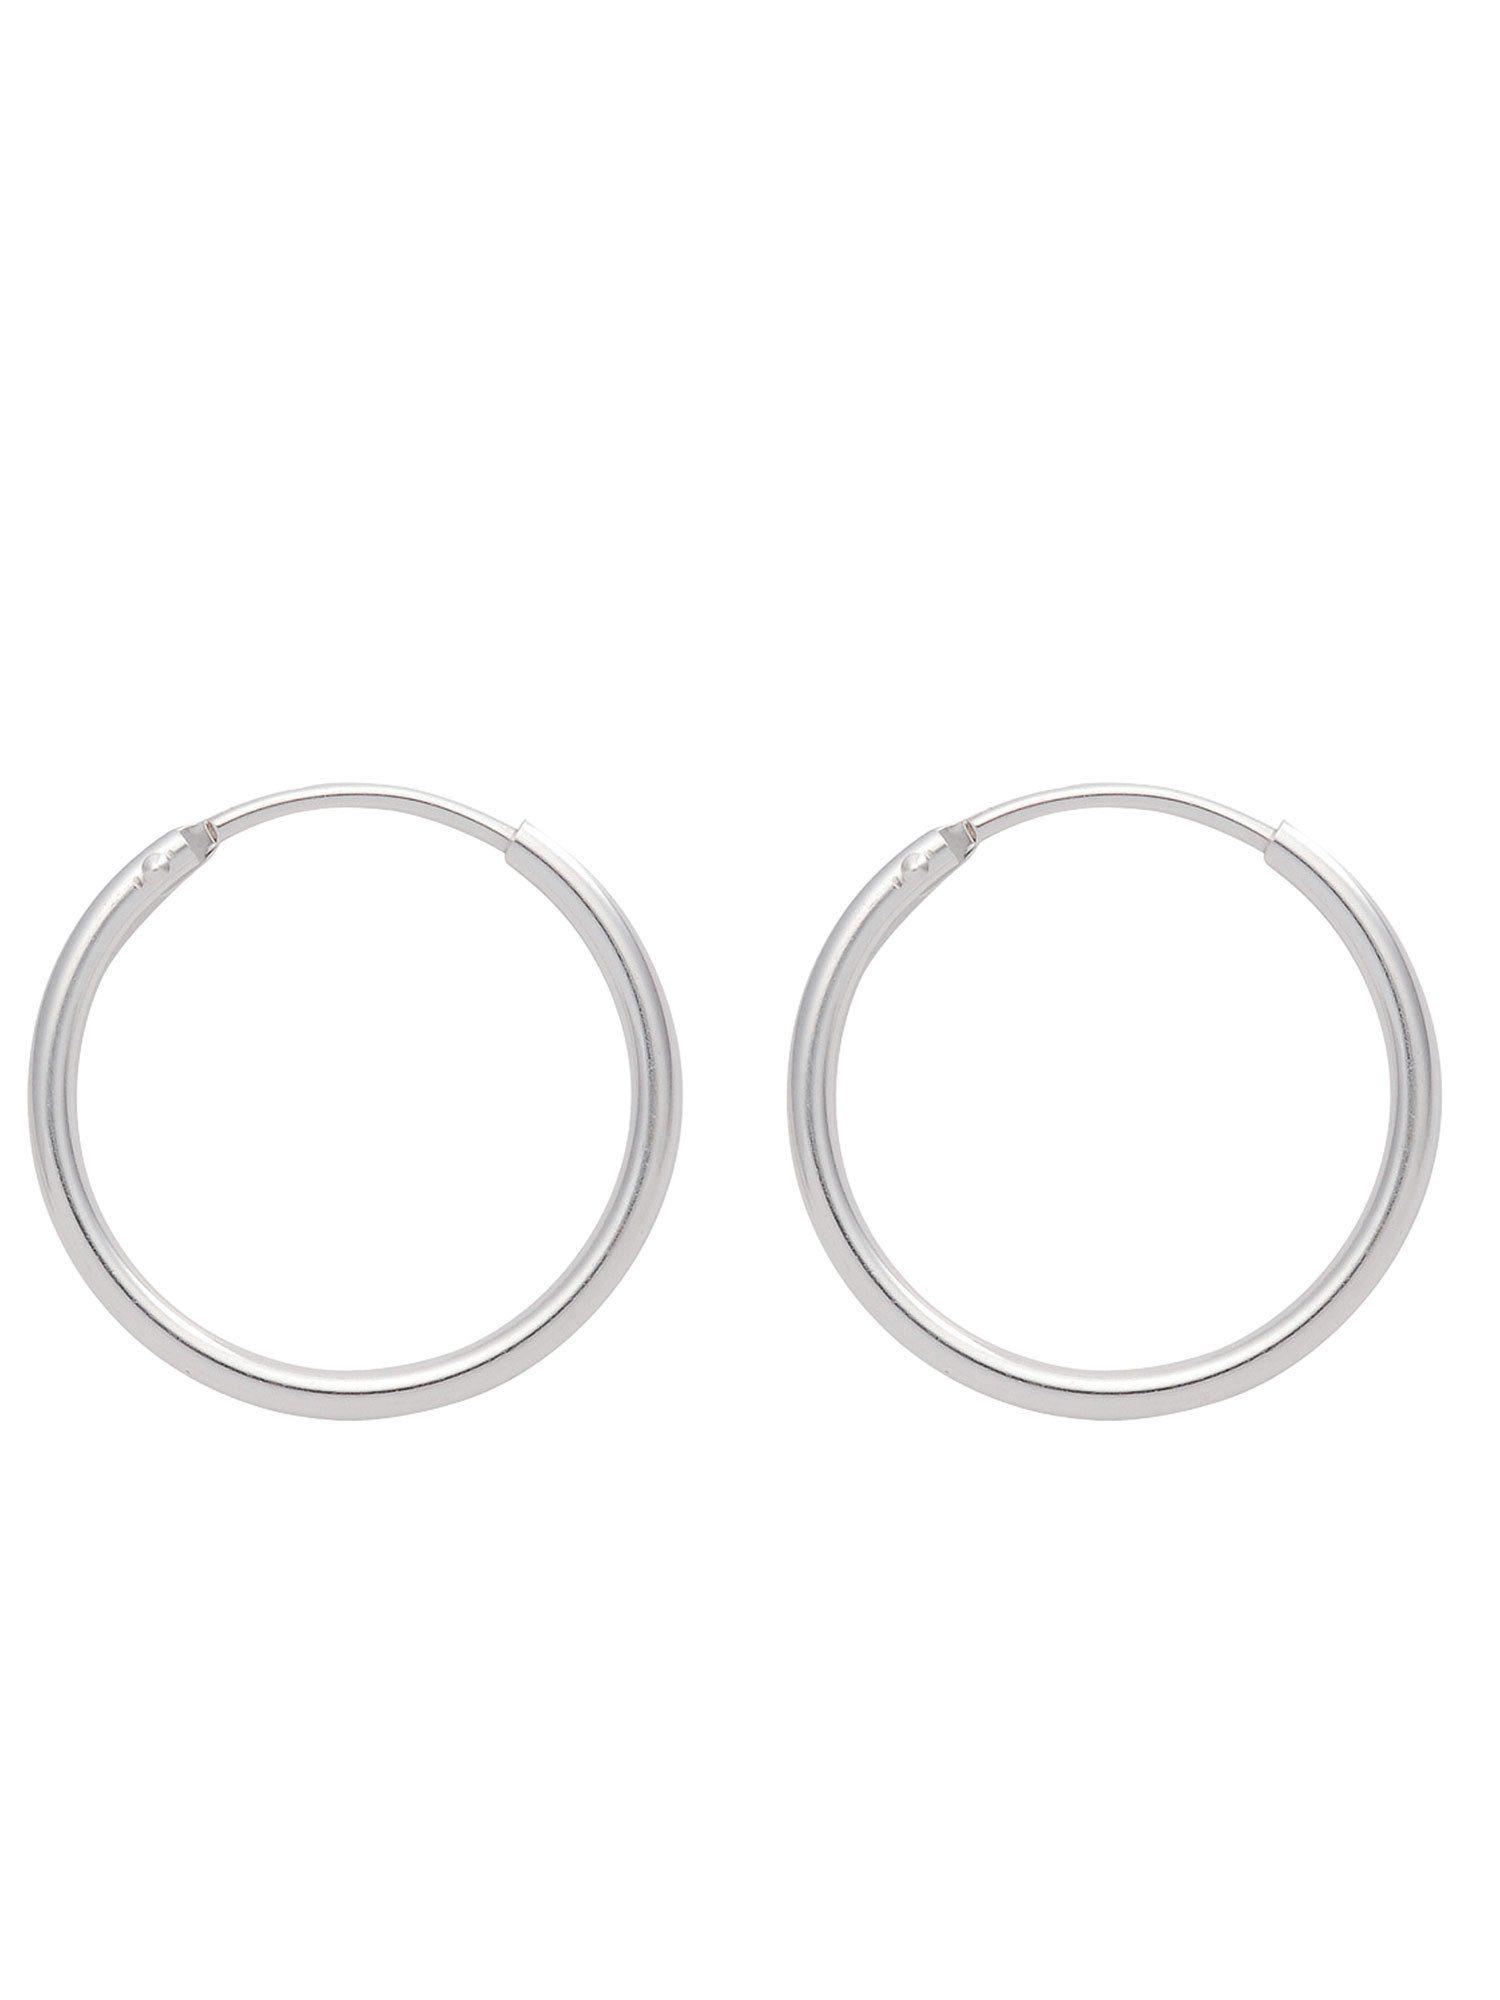 Adelia´s Paar Creolen »Silber 925 Sterling Silver Ohrringe - Creolen« 925 Sterling Silber Ø 1.1 cm